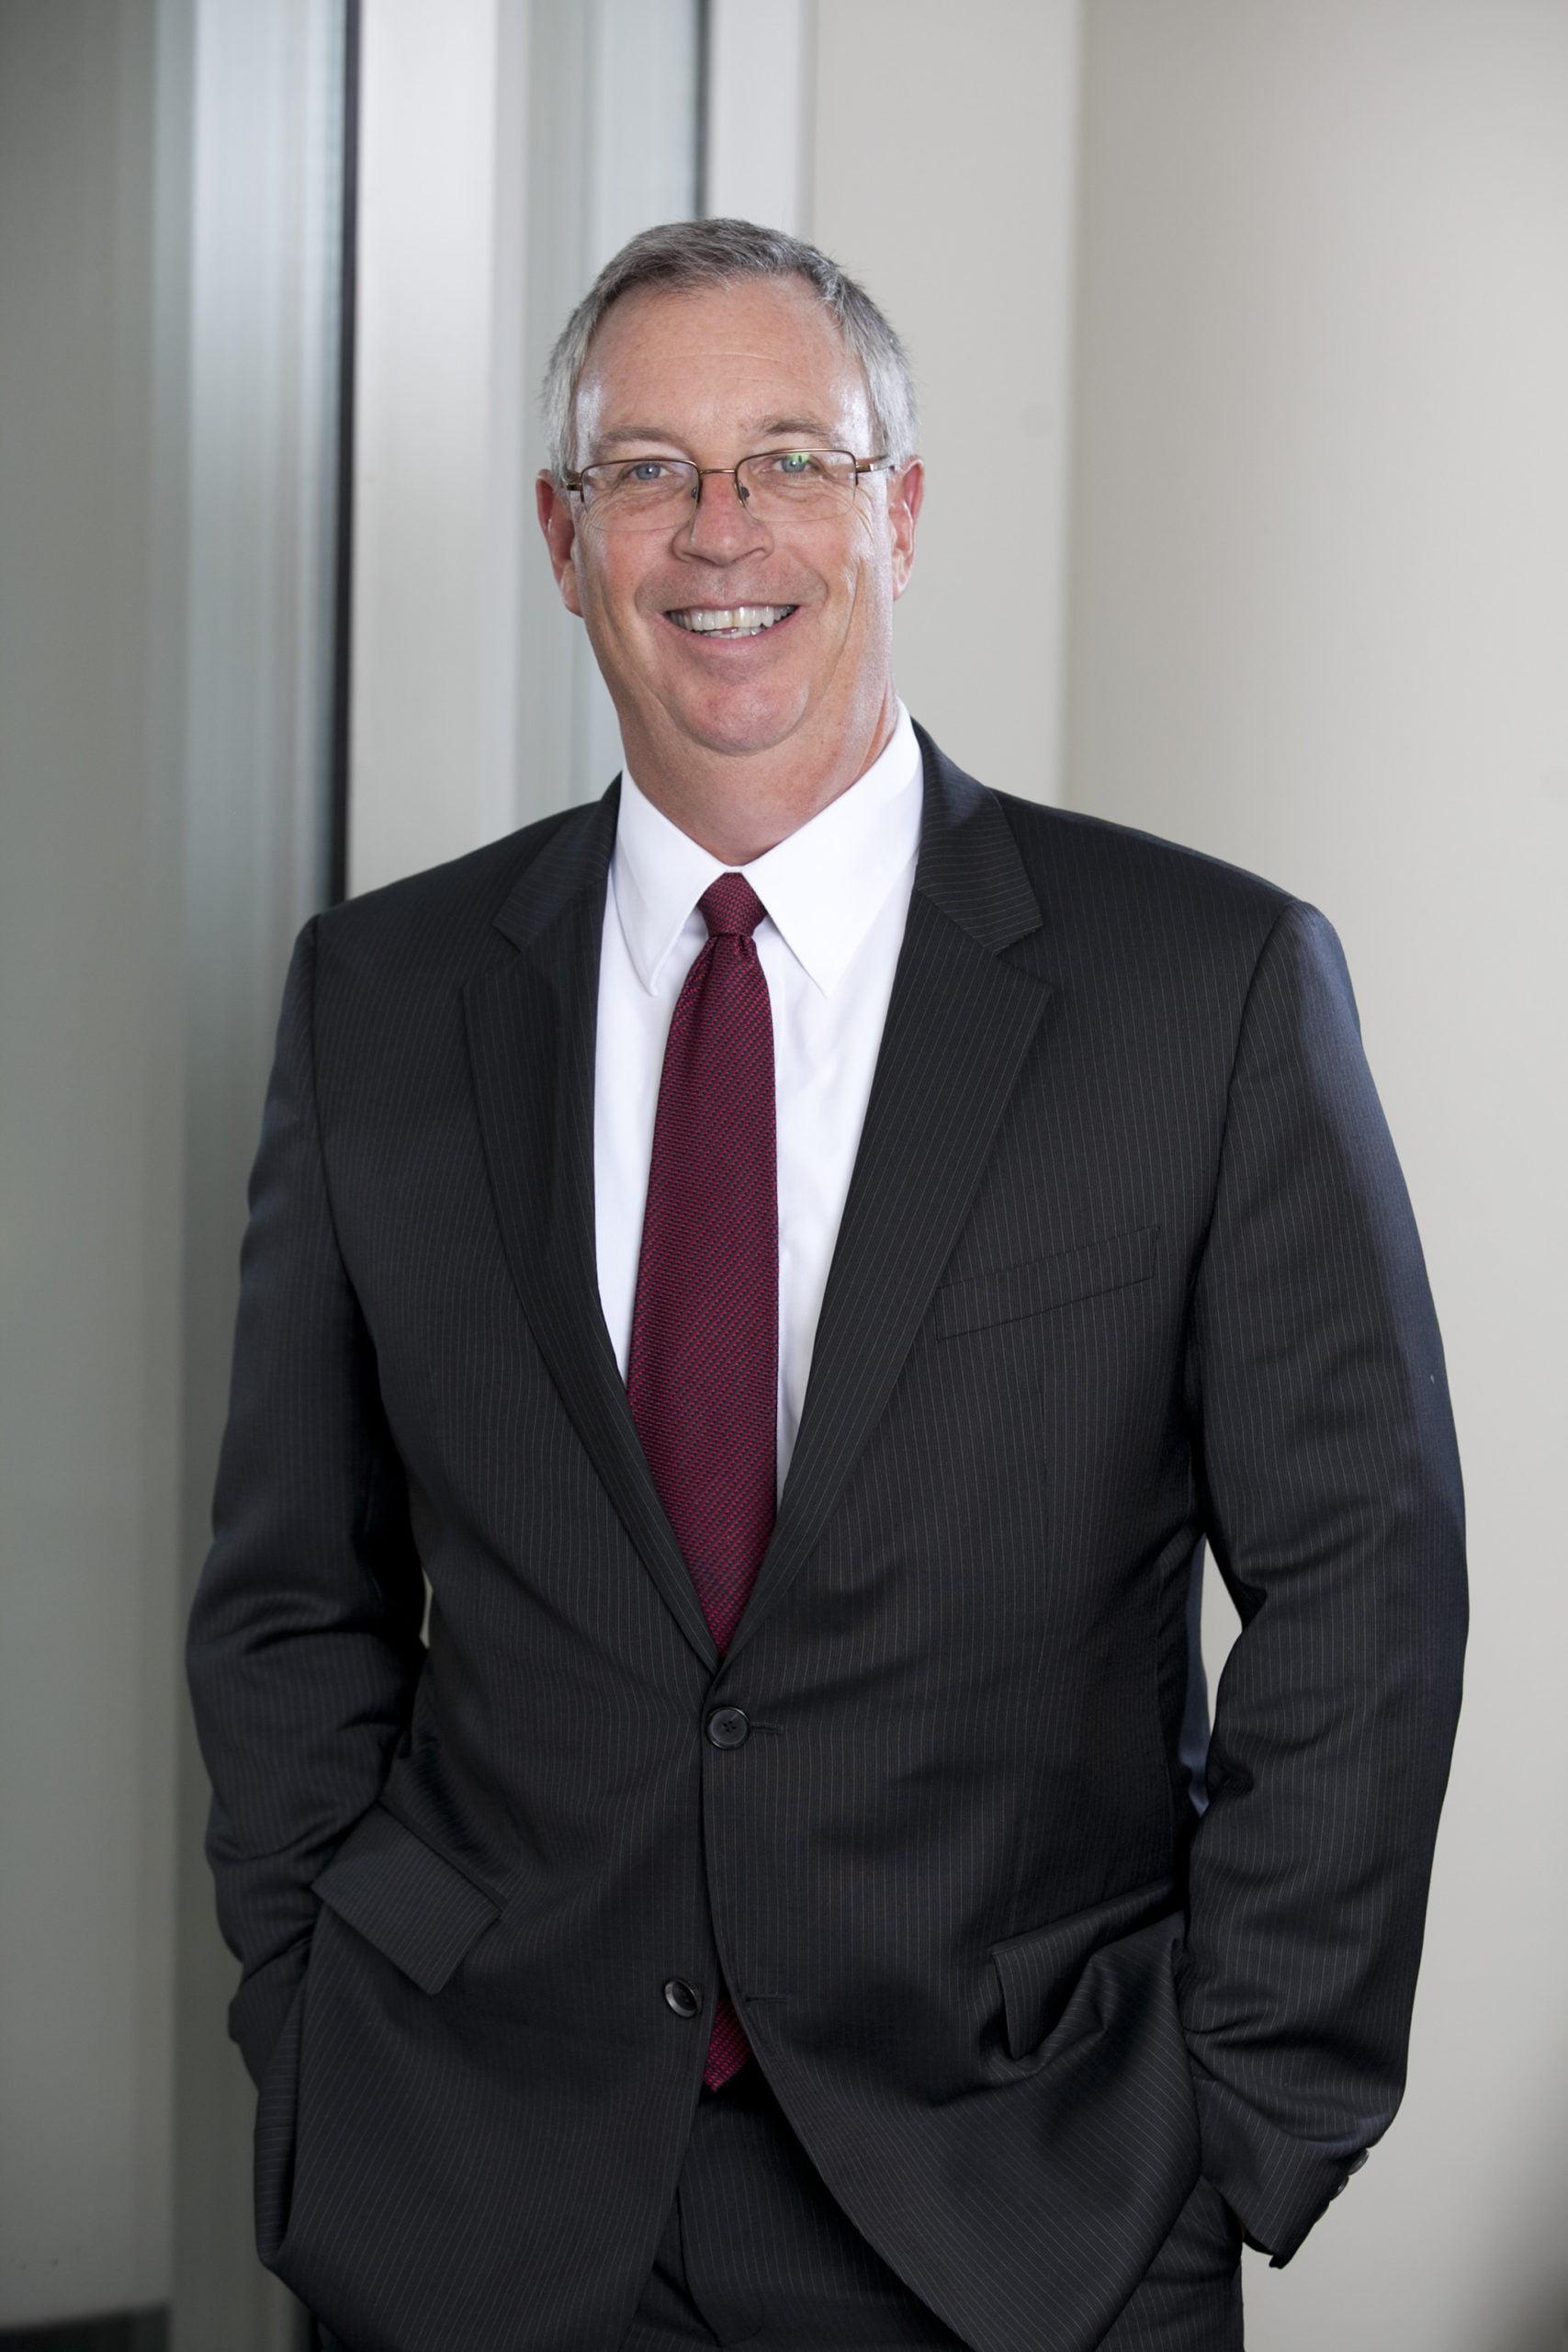 Stephen J. Smalling